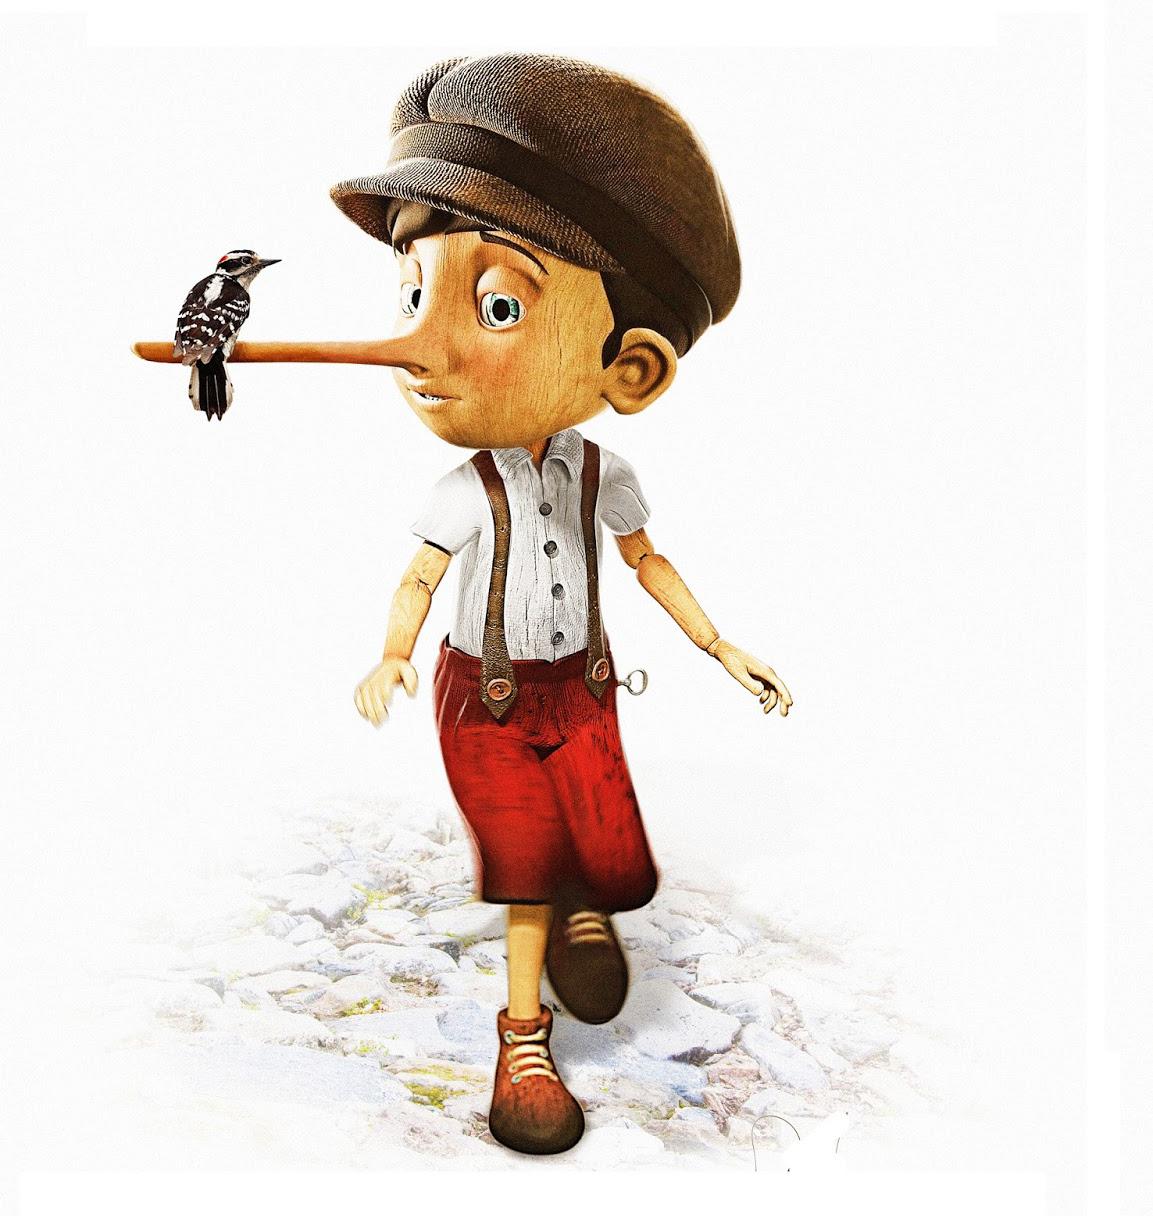 Gambar lucu Kartun Pinokio